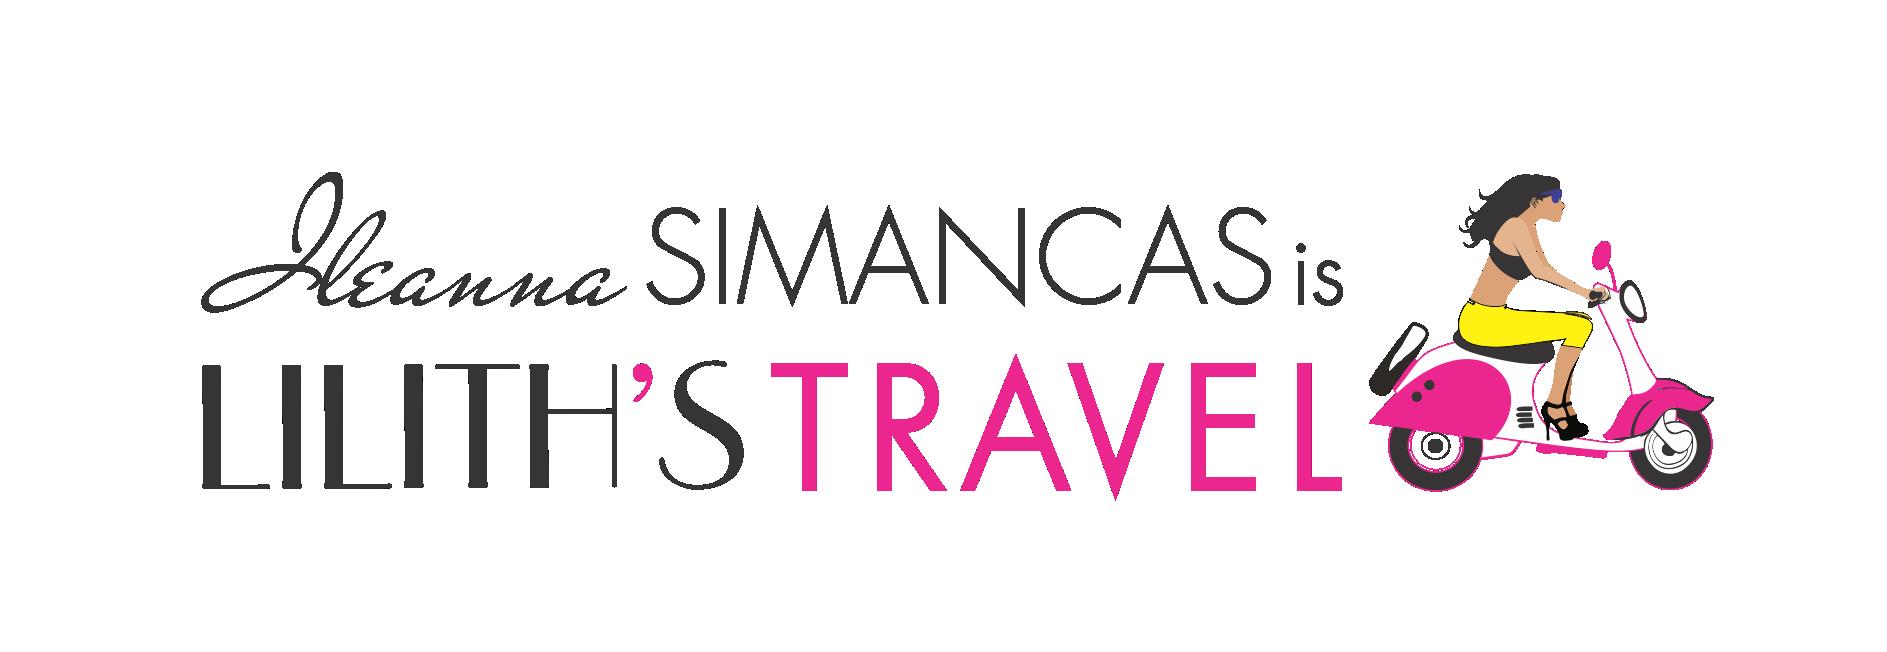 Ileanna Simancas – Lilith's Travel